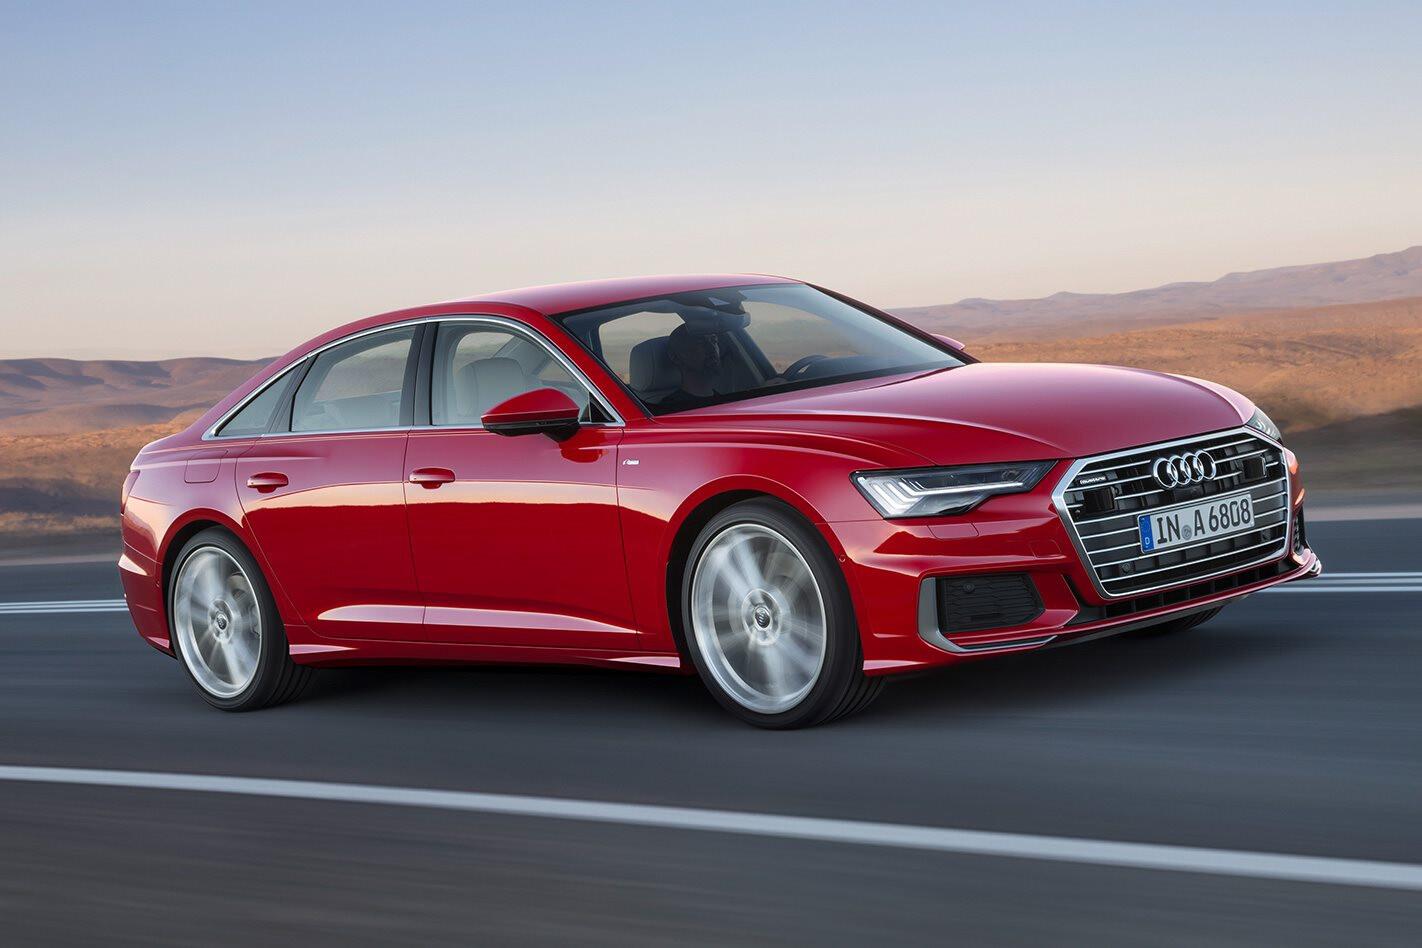 2019 Audi A6 breaks cover ahead of Geneva